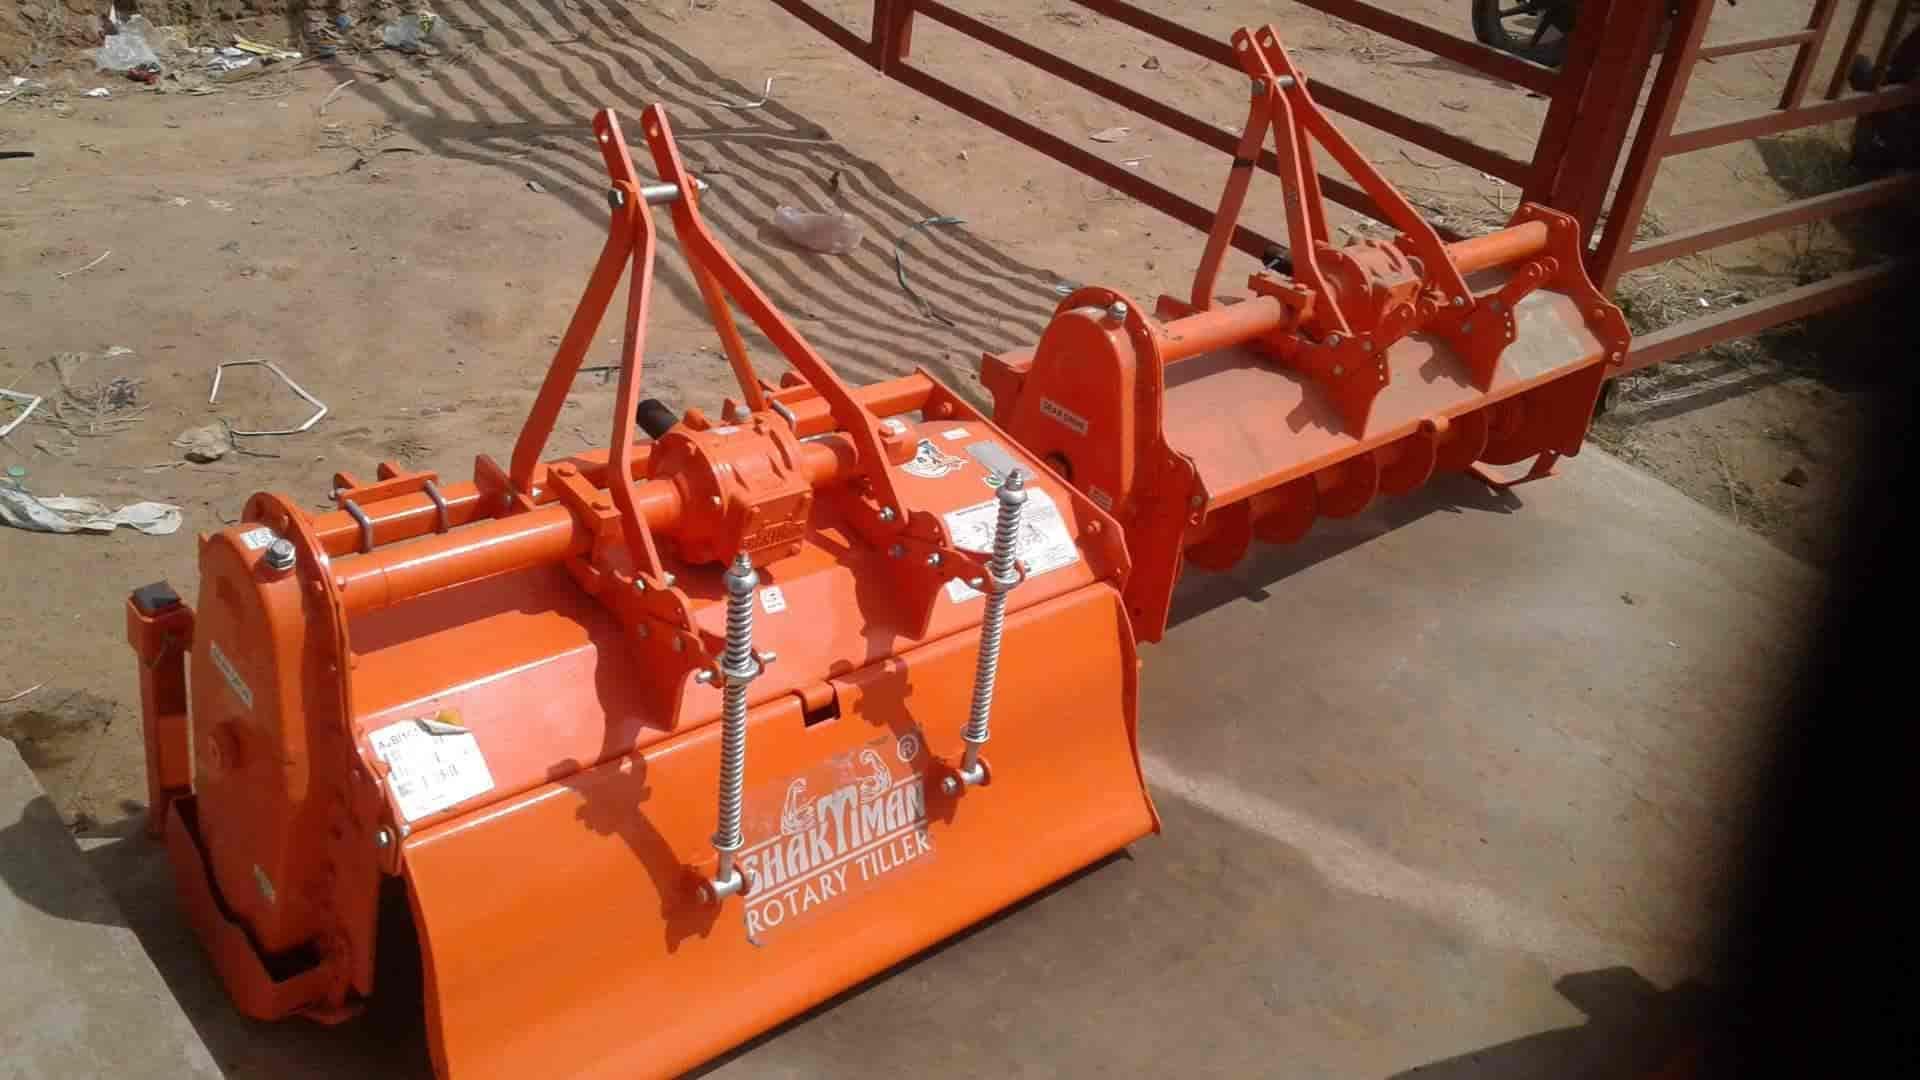 MADRAS AGRO SERVICE, Bharath PETROL BUNK - Agricultural Equipment